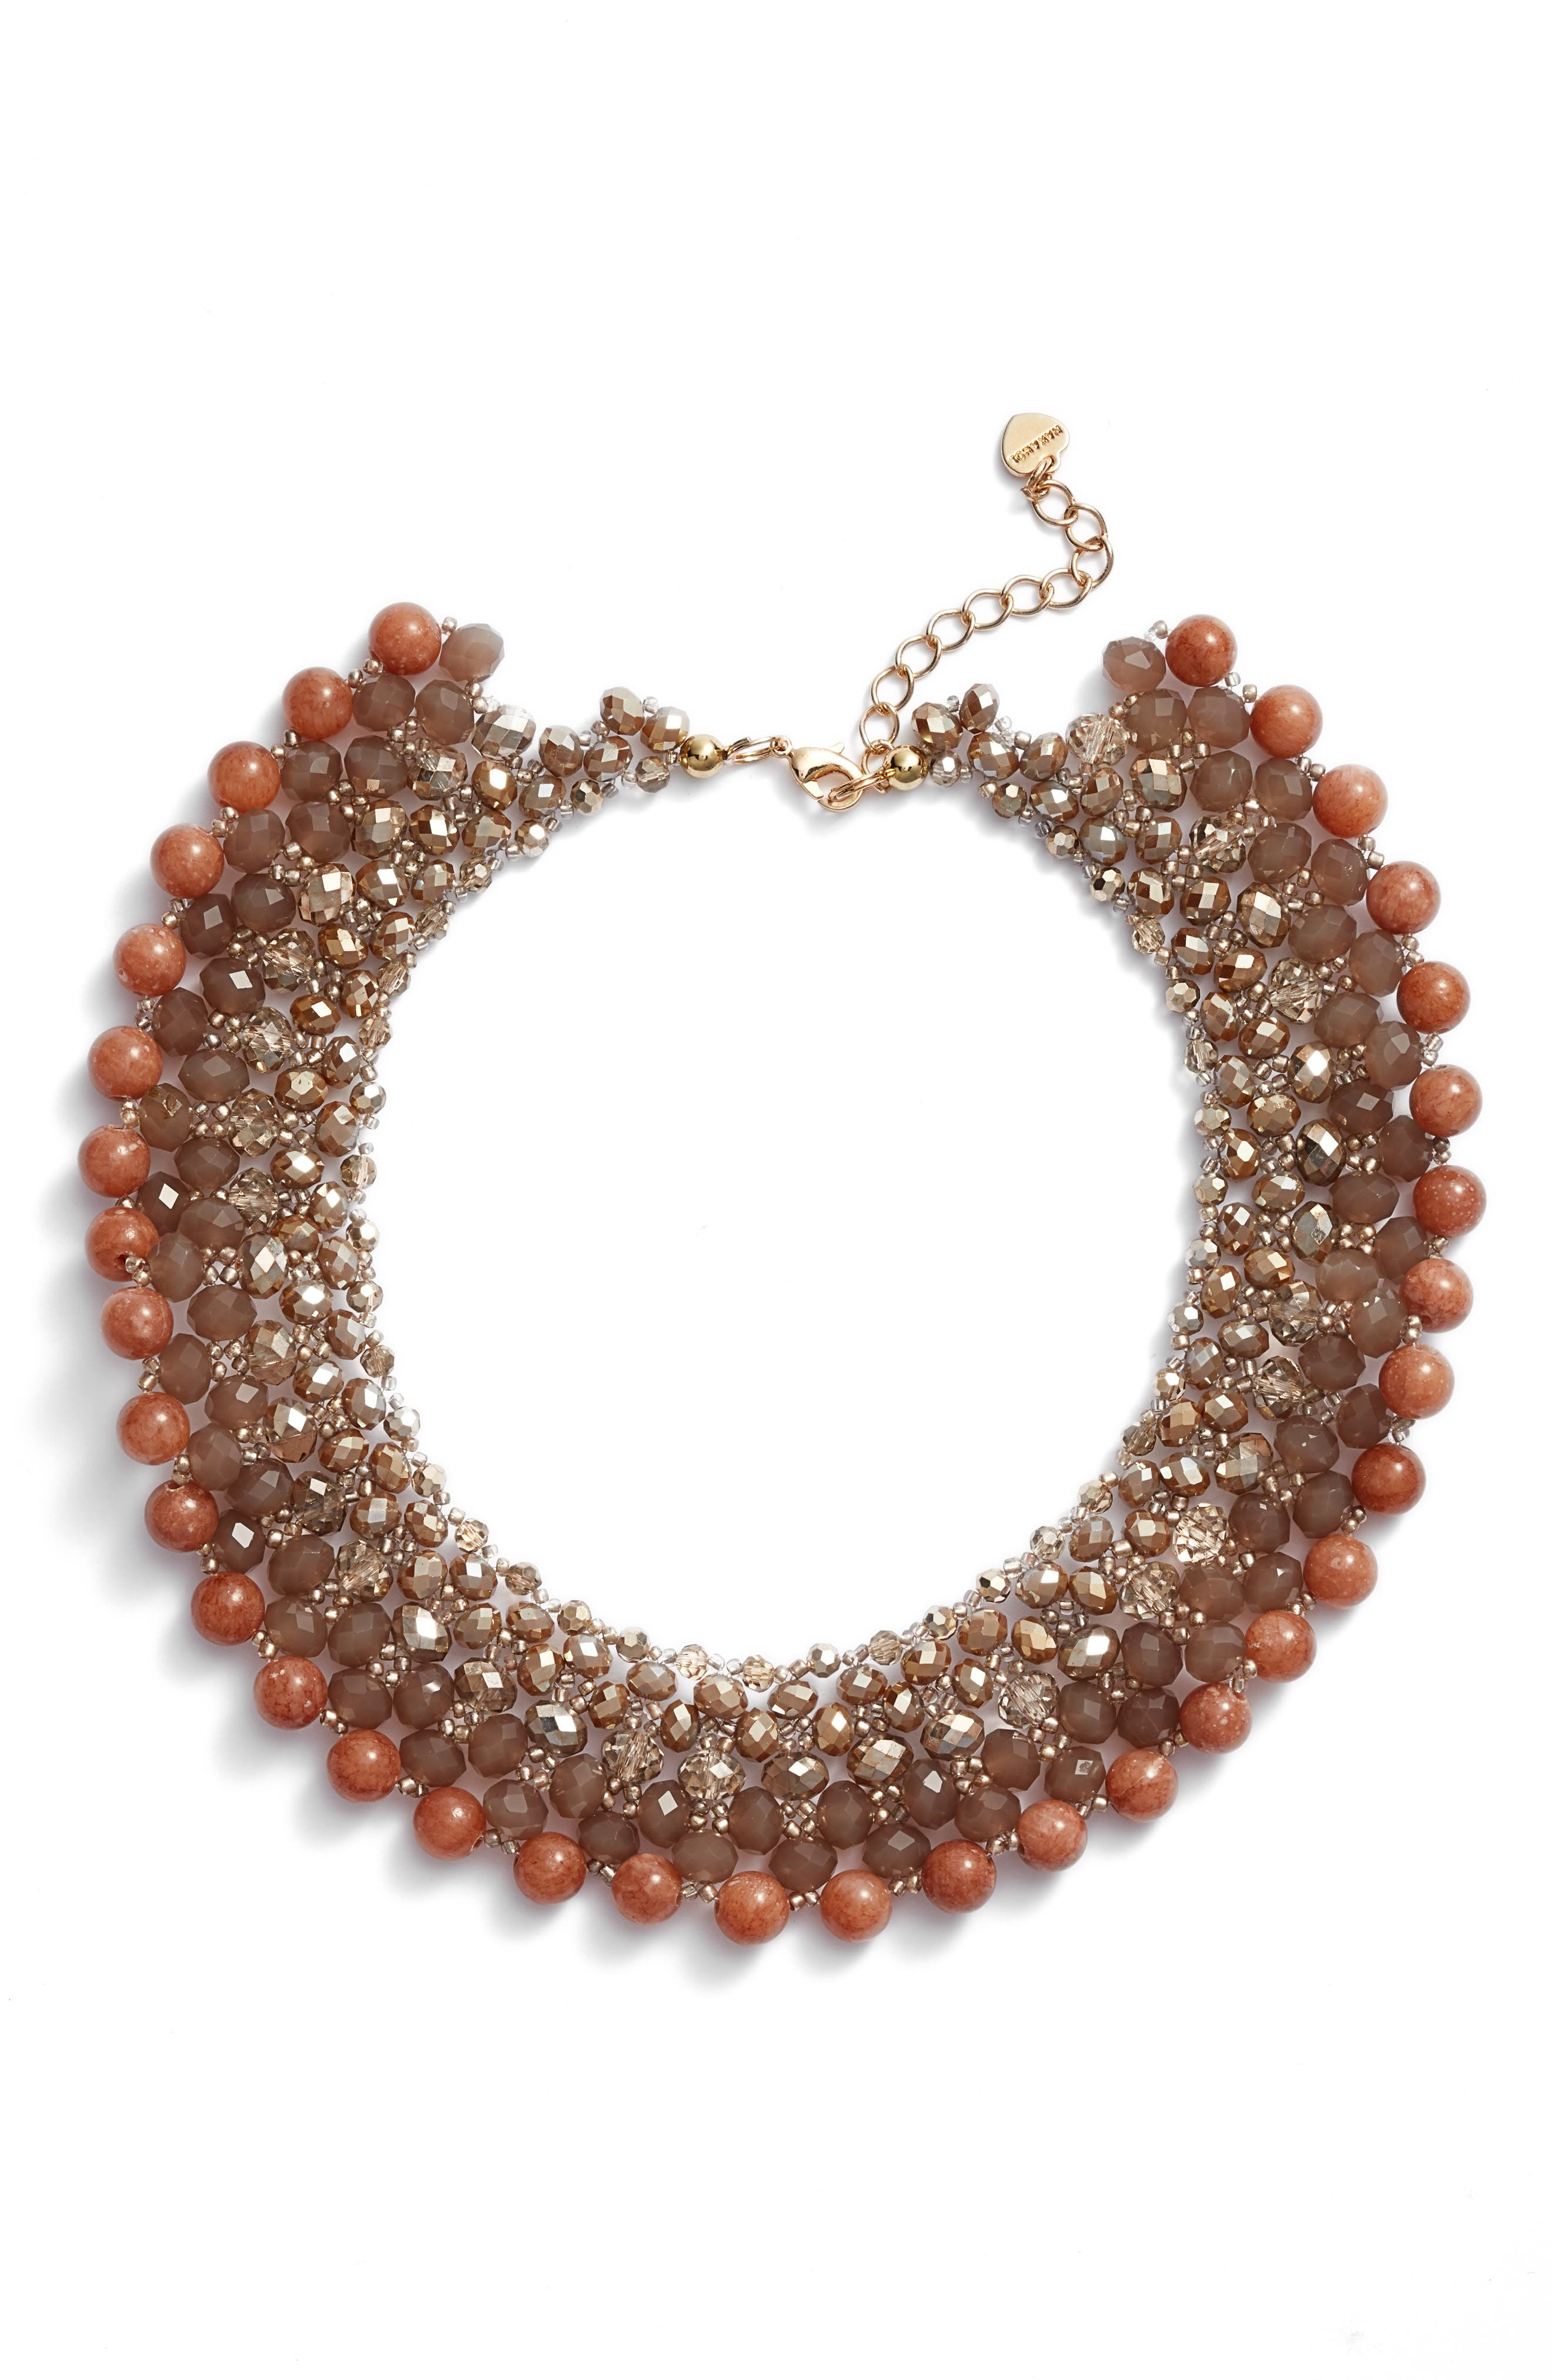 Nakamol Design Crochet Stone Collar Necklace